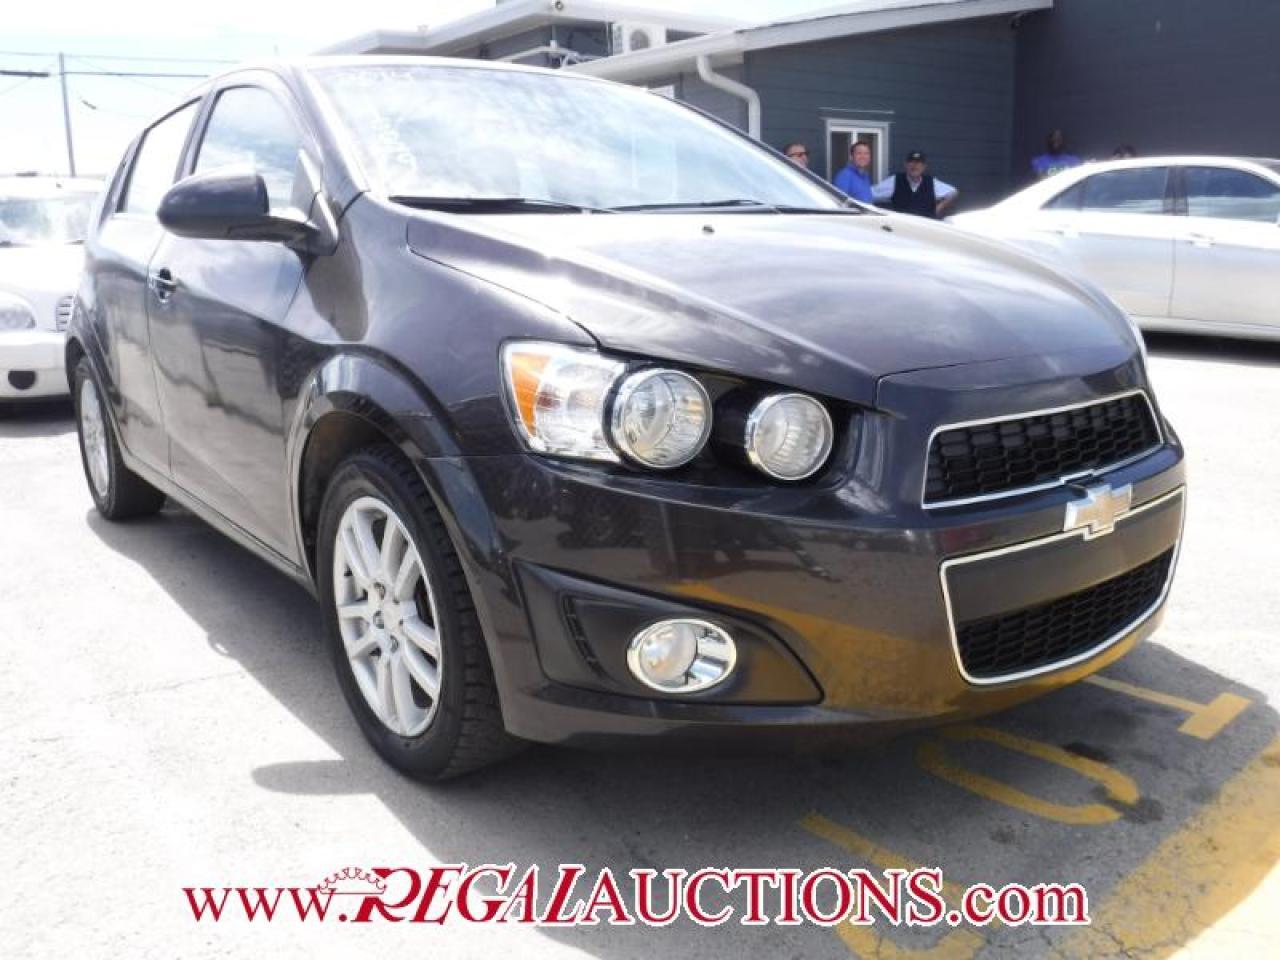 Photo of Brown 2014 Chevrolet SONIC LT 5D HATCHBACK AT